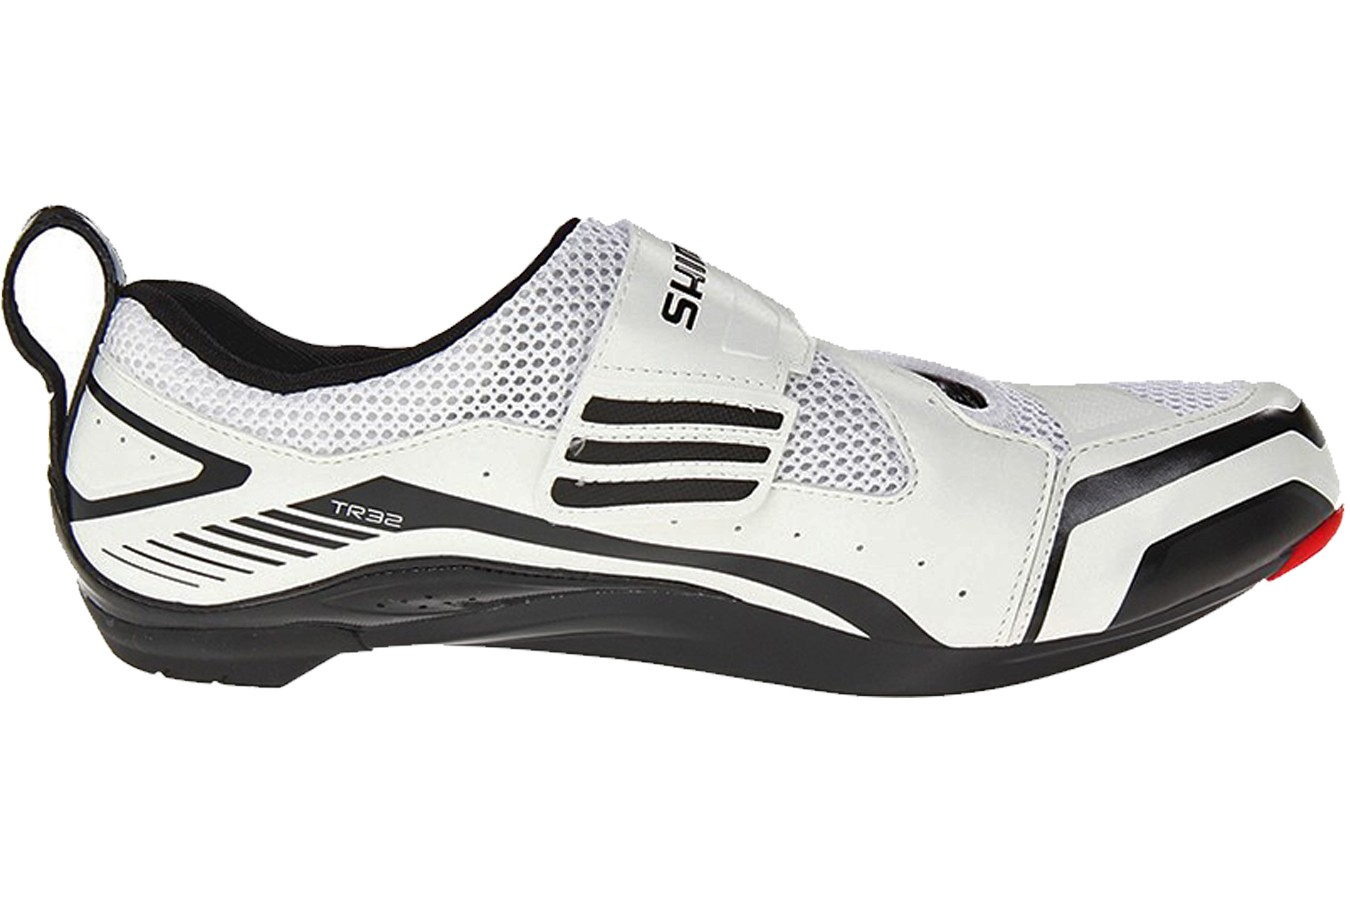 Sapatilha Triathlon SH-TR32 - Shimano